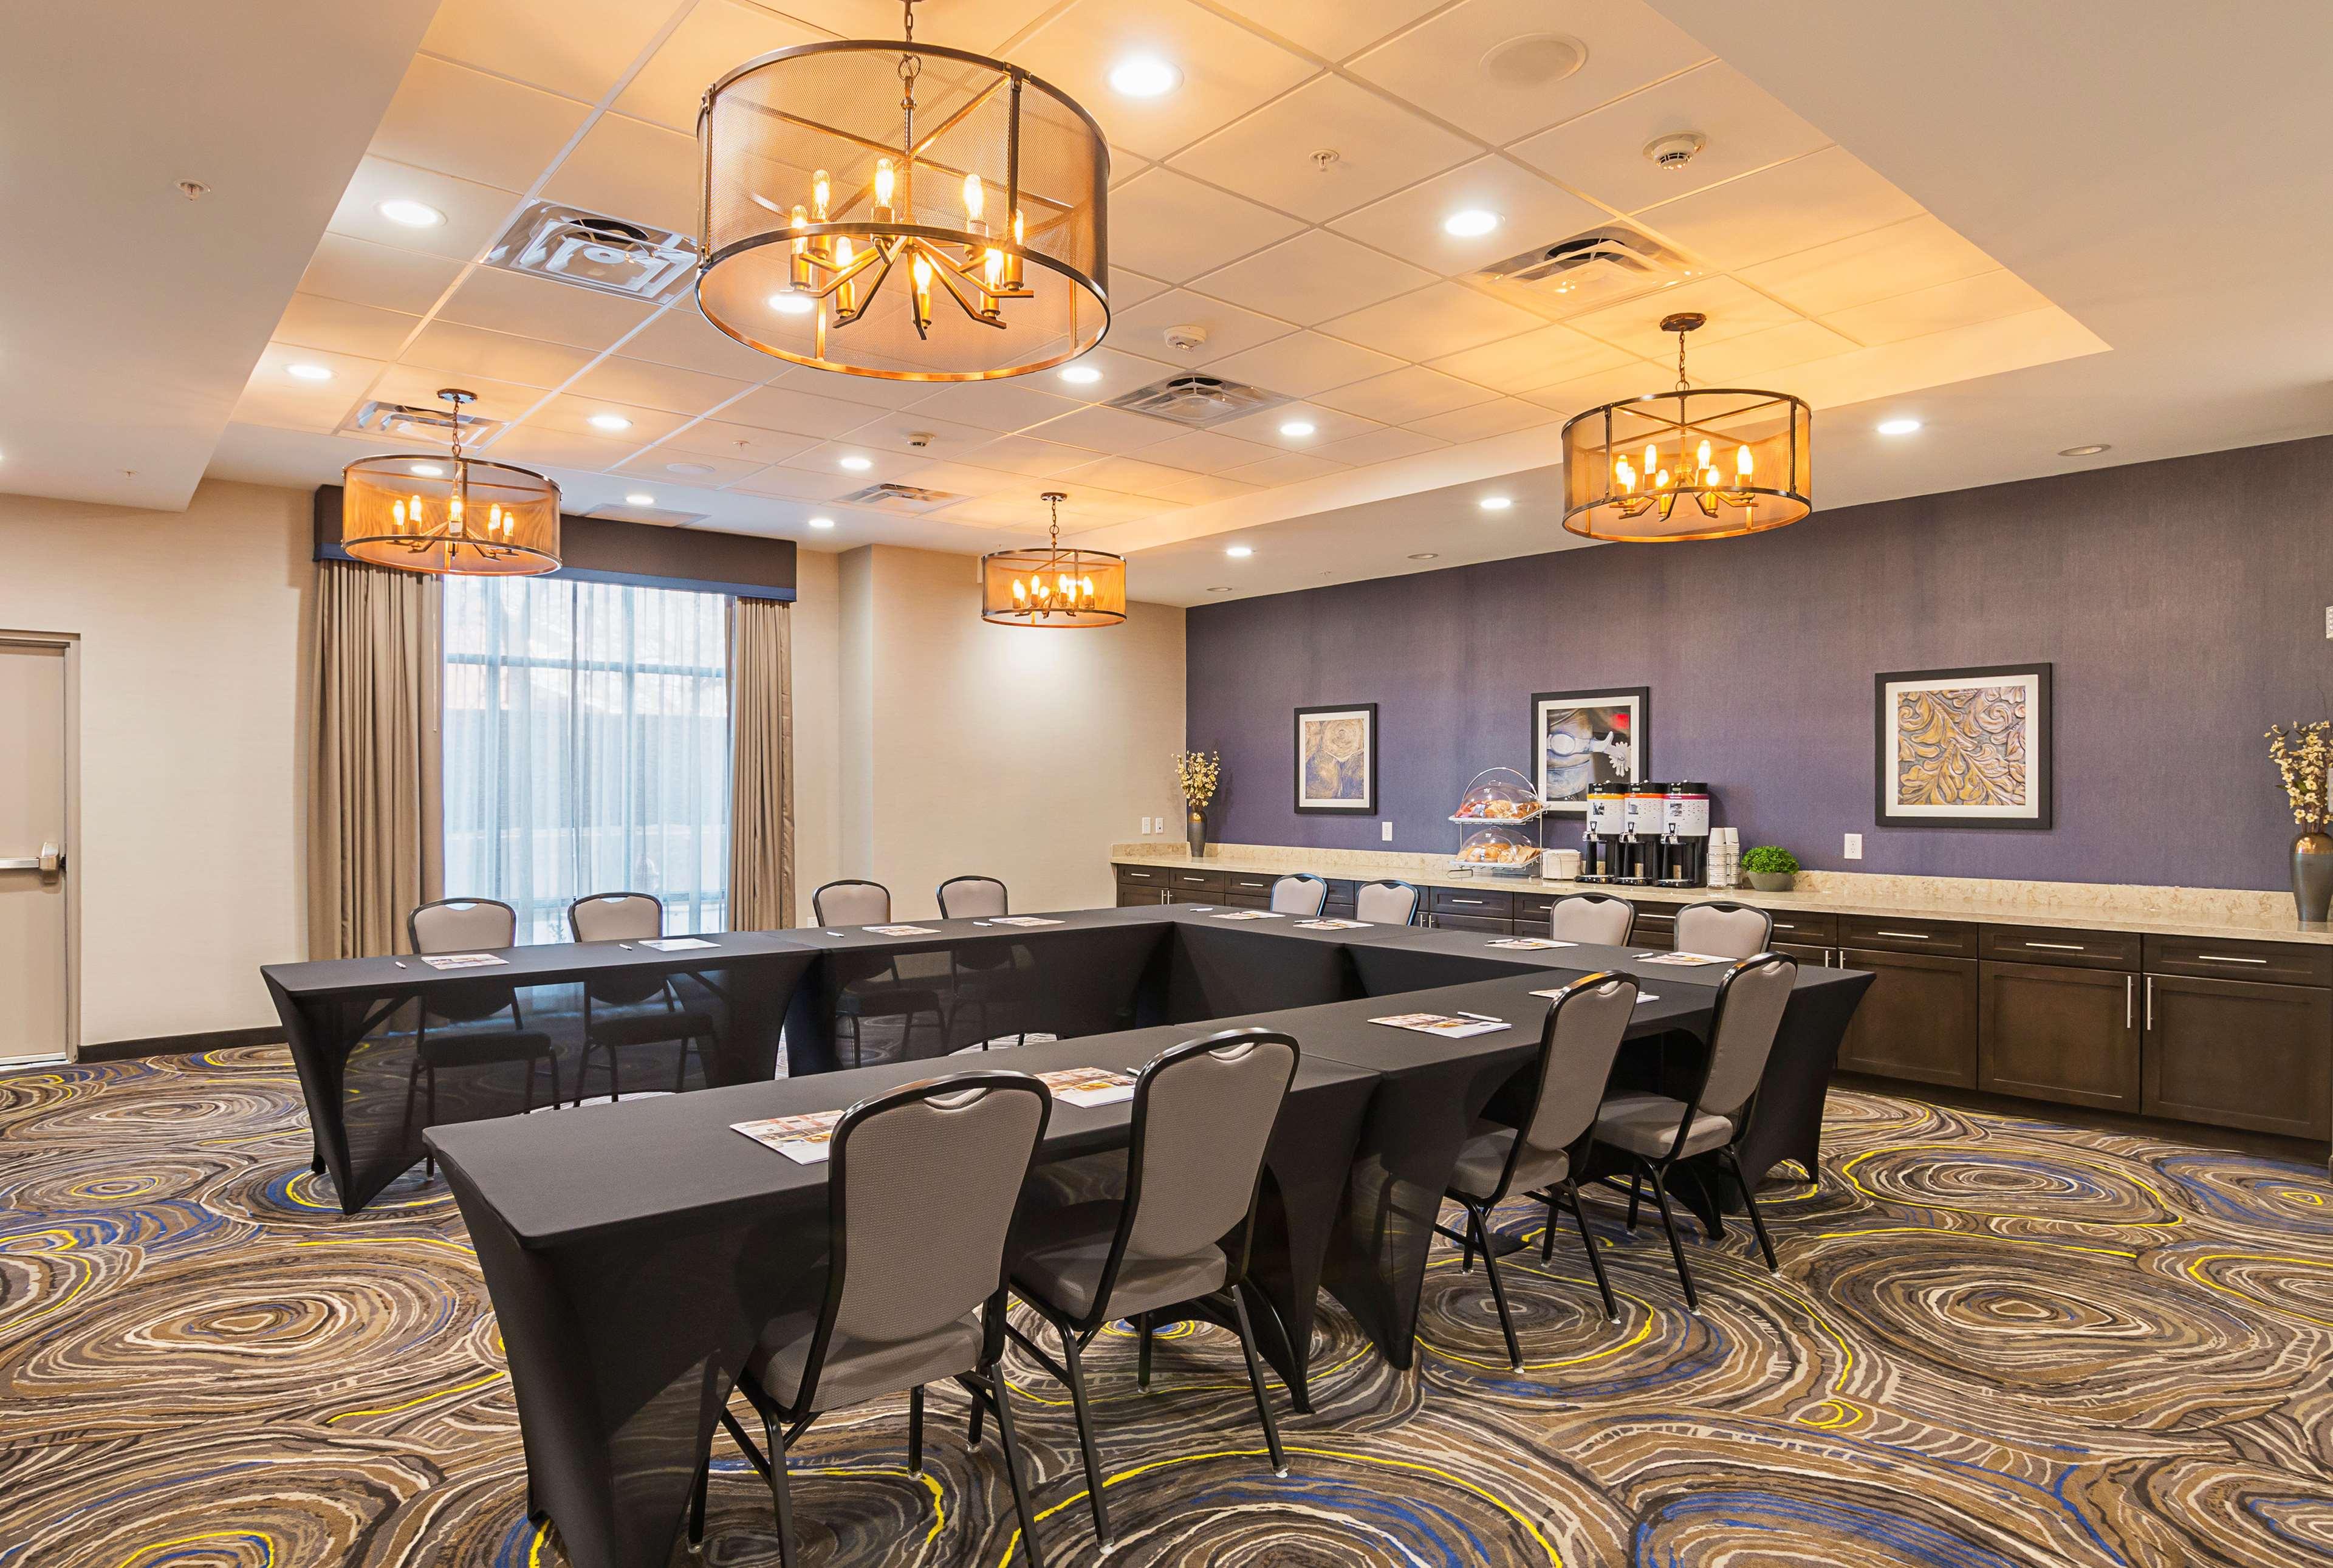 Hampton Inn & Suites Colleyville DFW West image 48